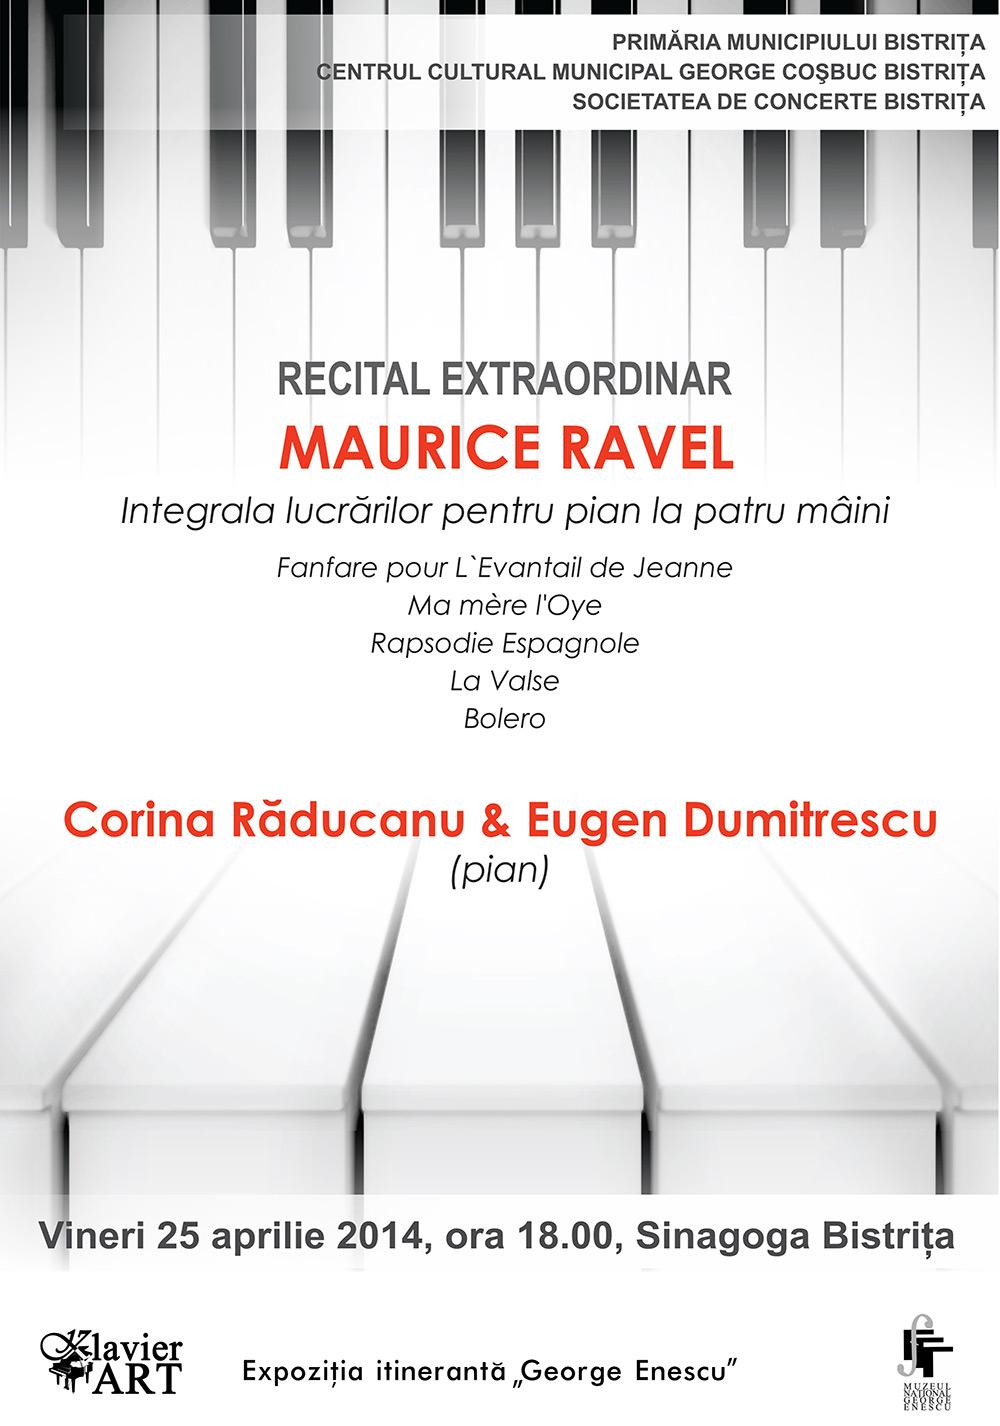 poster_maurice_ravel